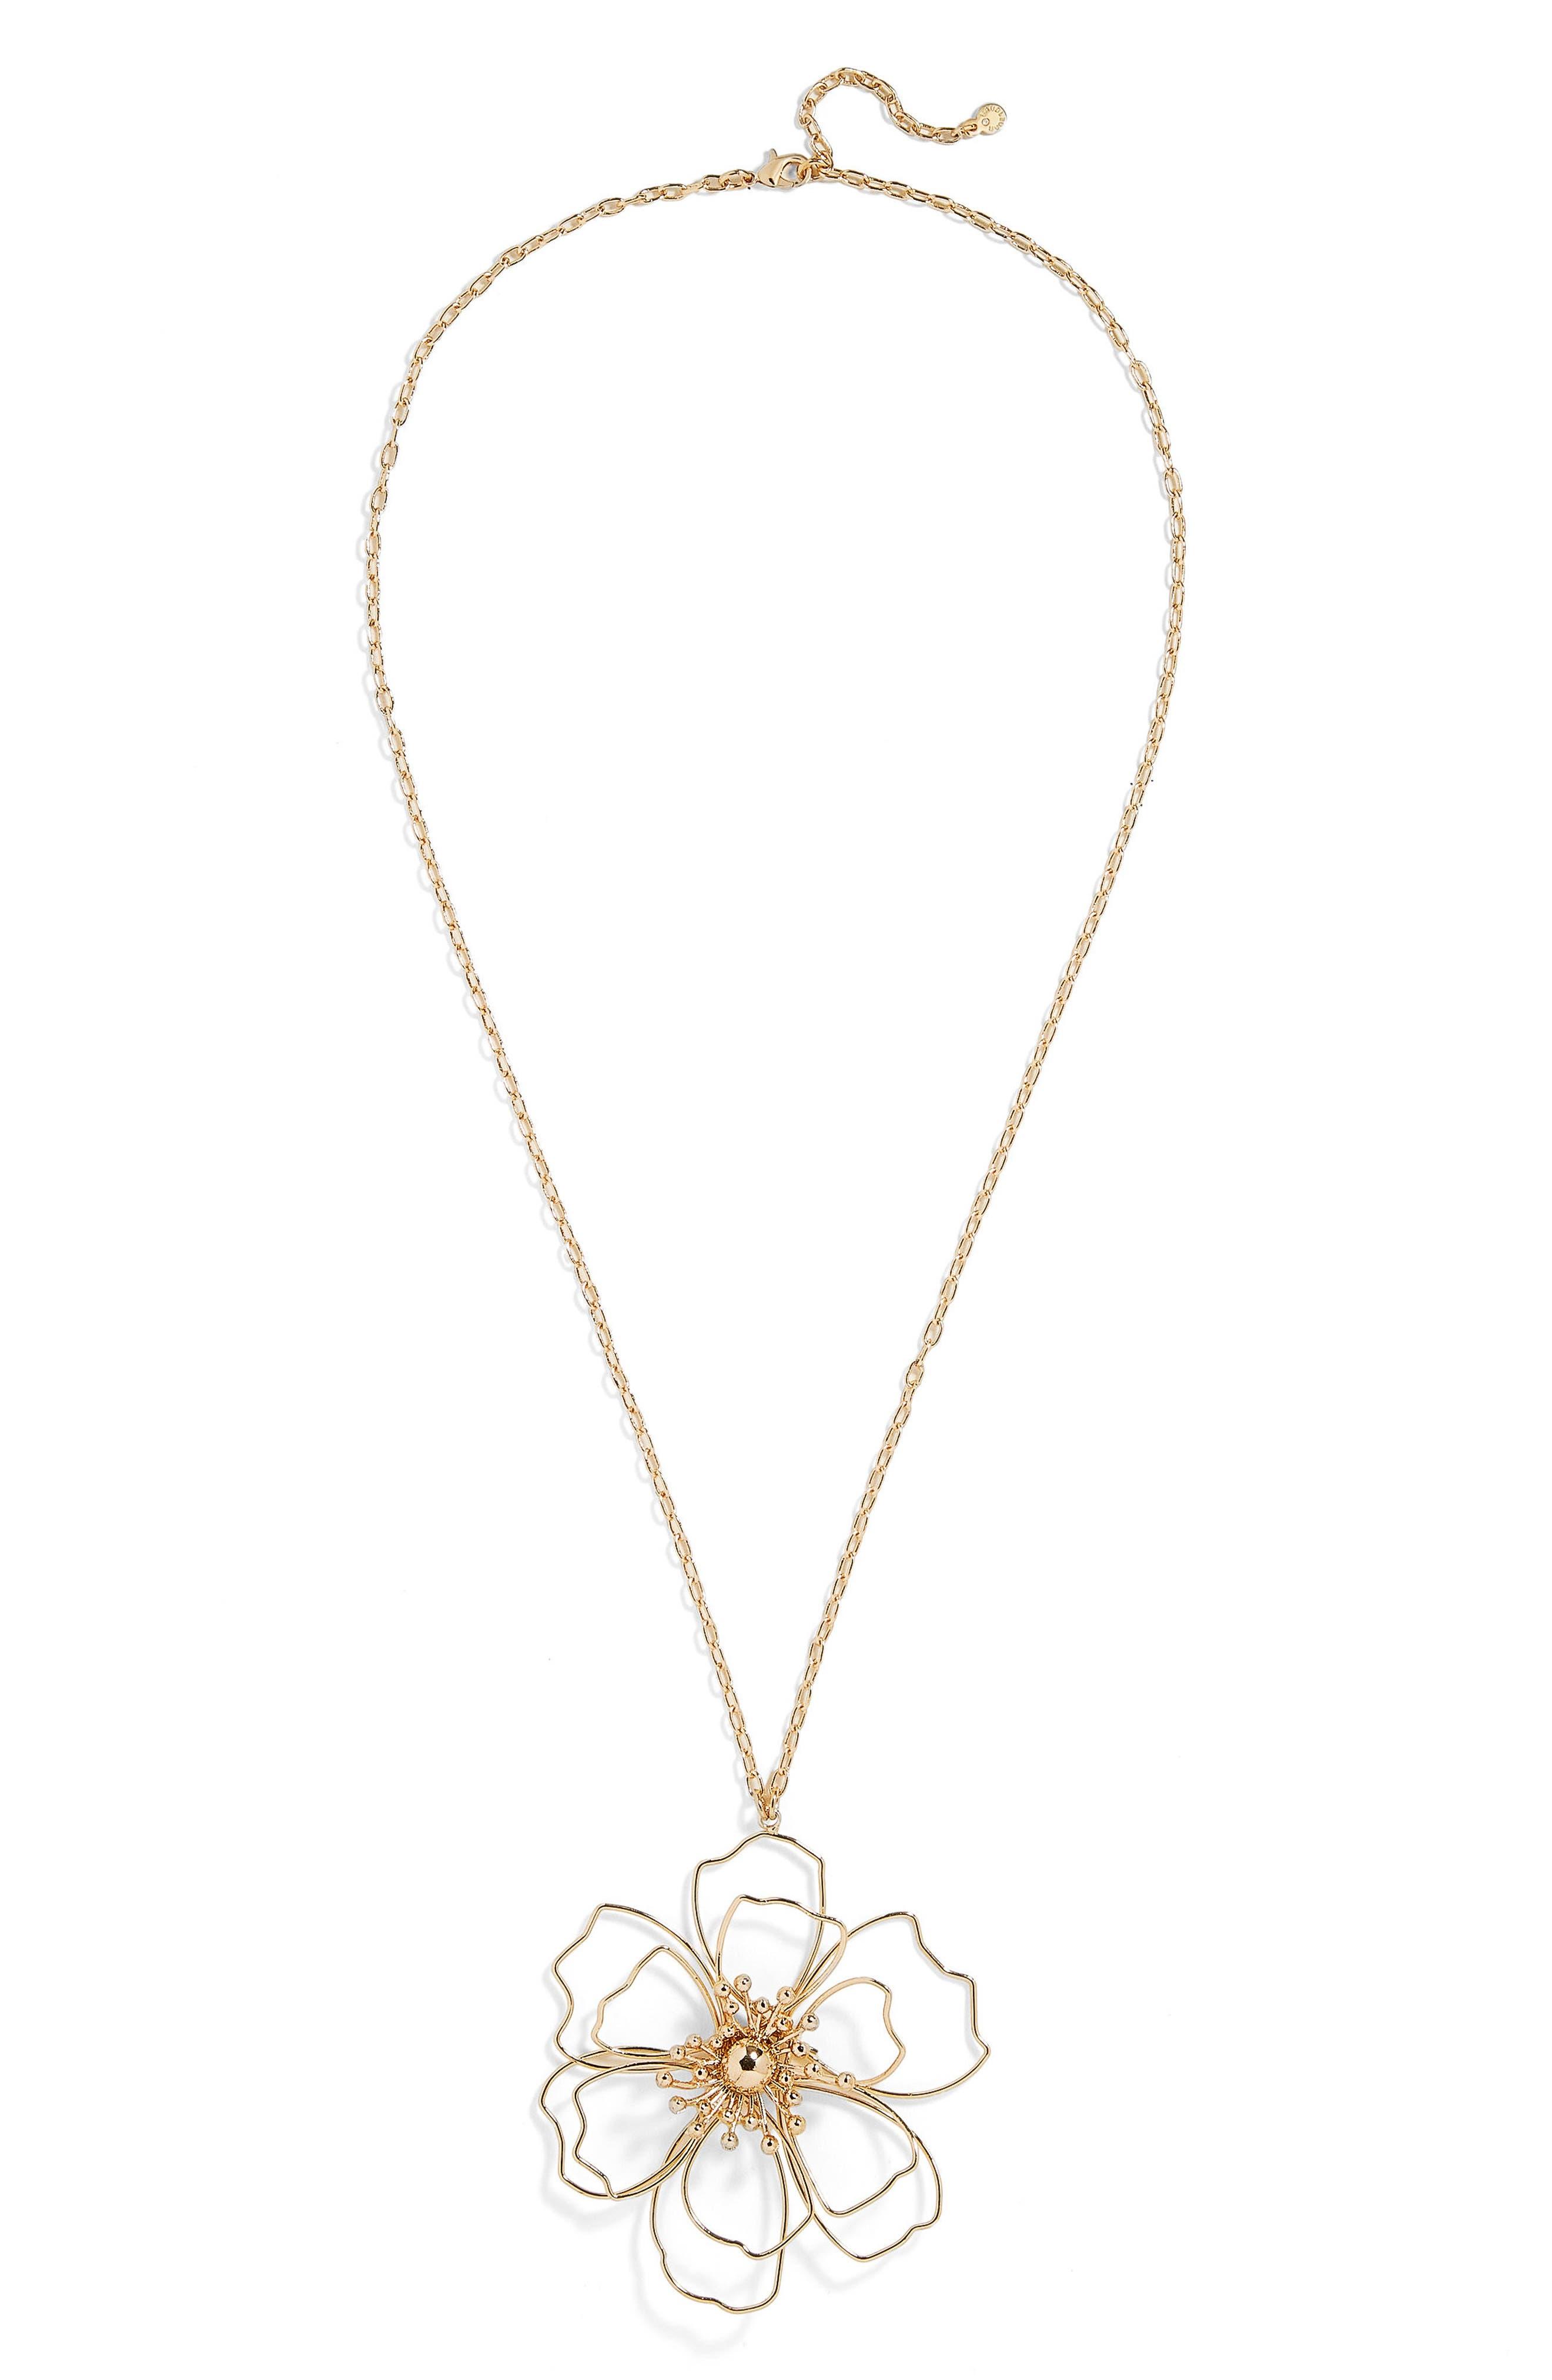 Main Image - BaubleBar Blossom Pendant Necklace